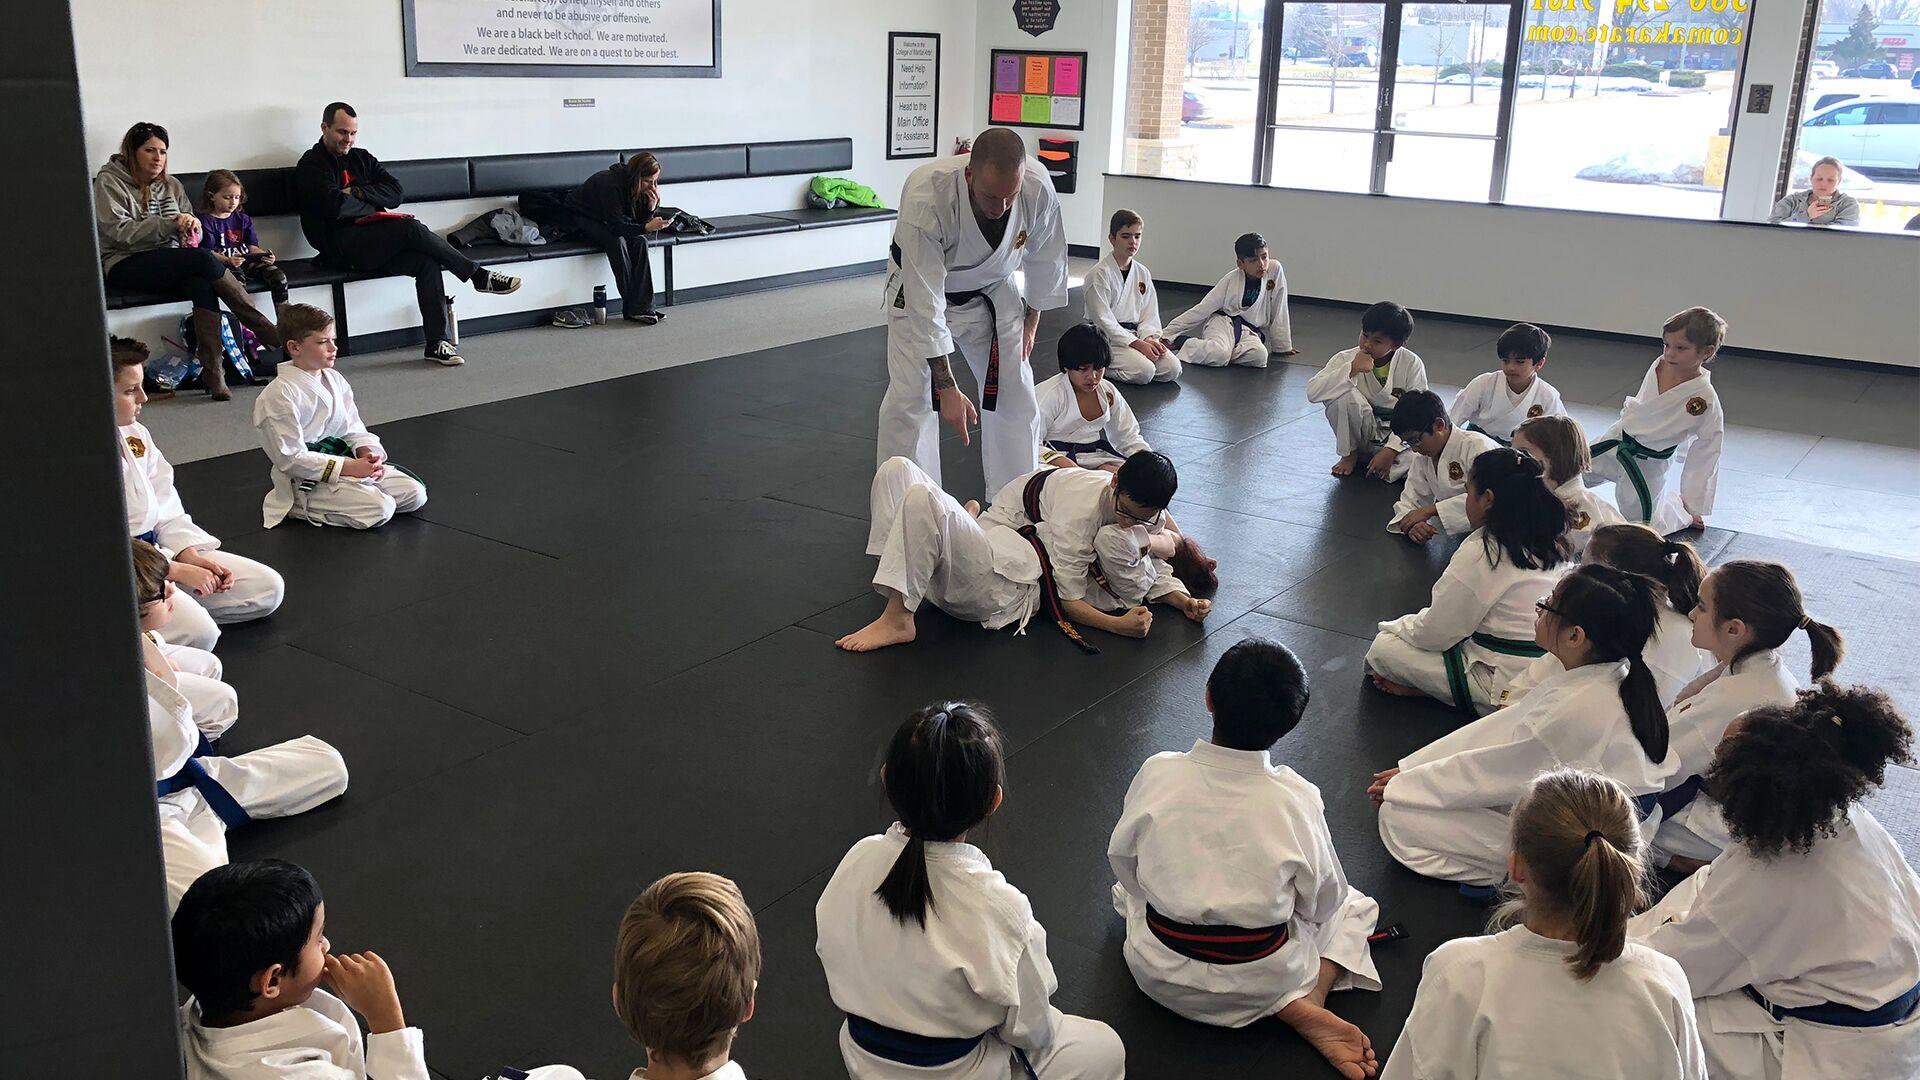 College of Martial Arts - Jiu Jitsu, Karate - Sterling Heights, MI